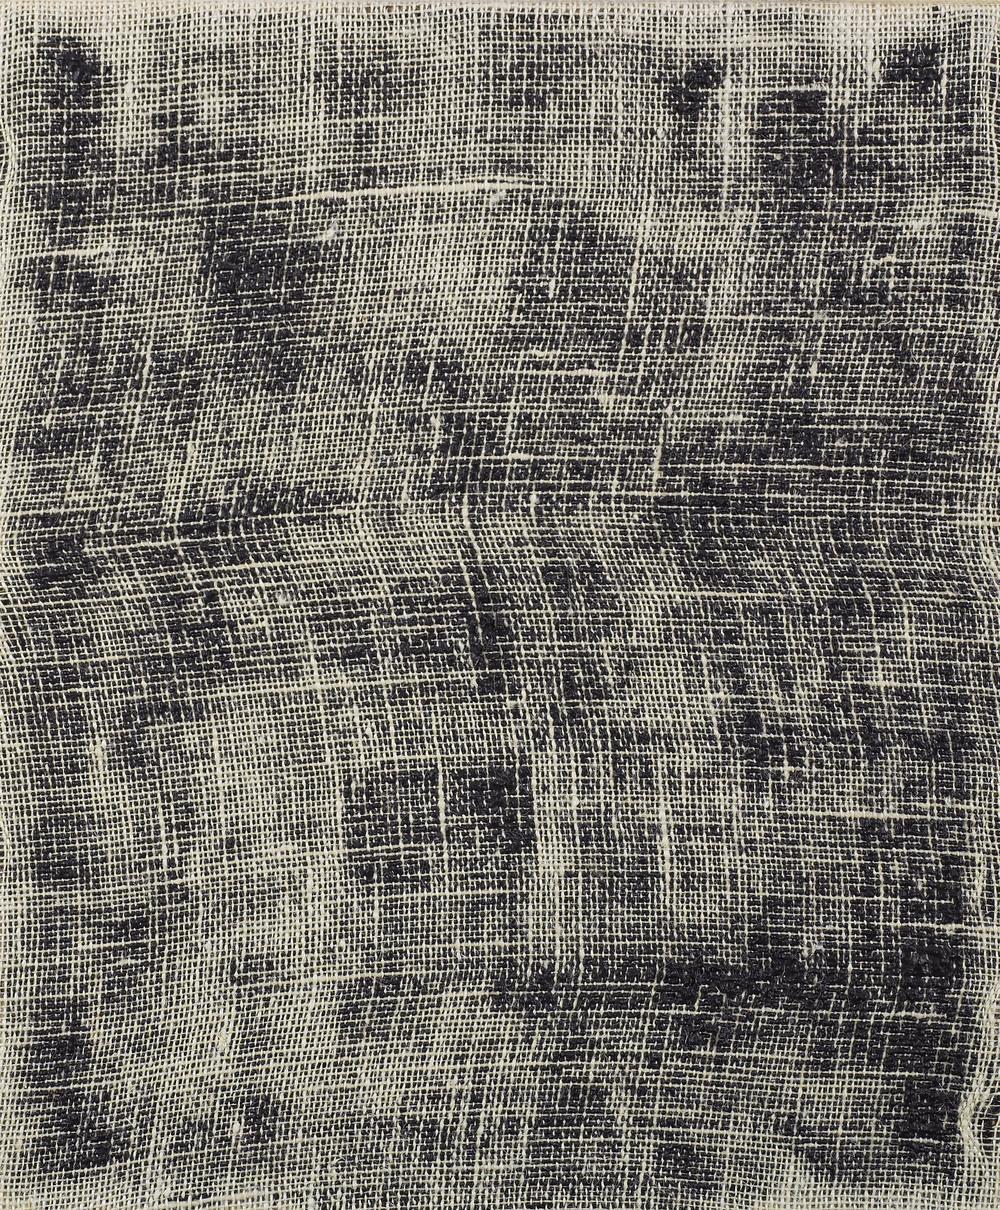 Porosity (Black II), 2014  , acrylic on burlap, 20 x 16 inches